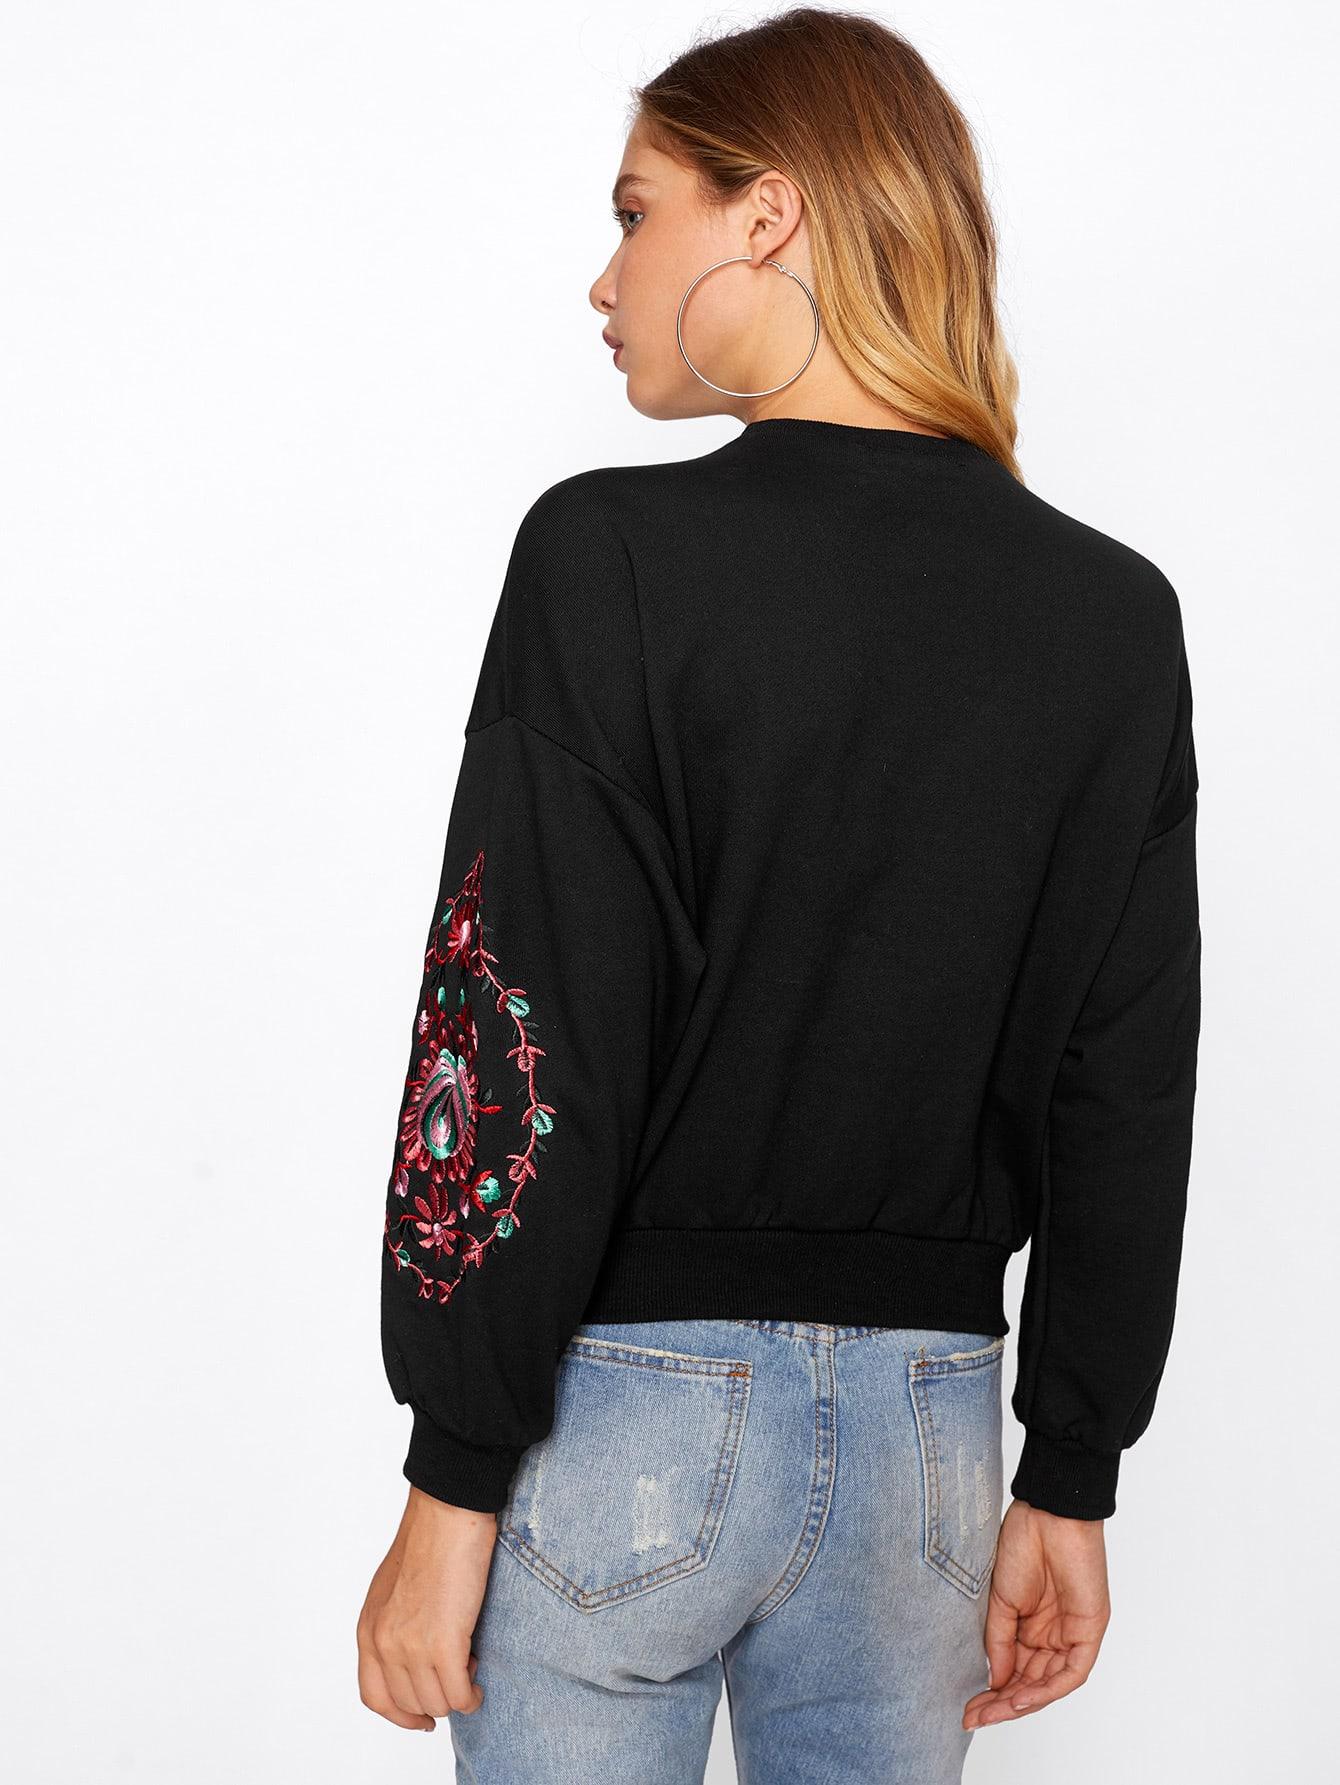 Lace Up Choker Neck Embroidered Sweatshirt